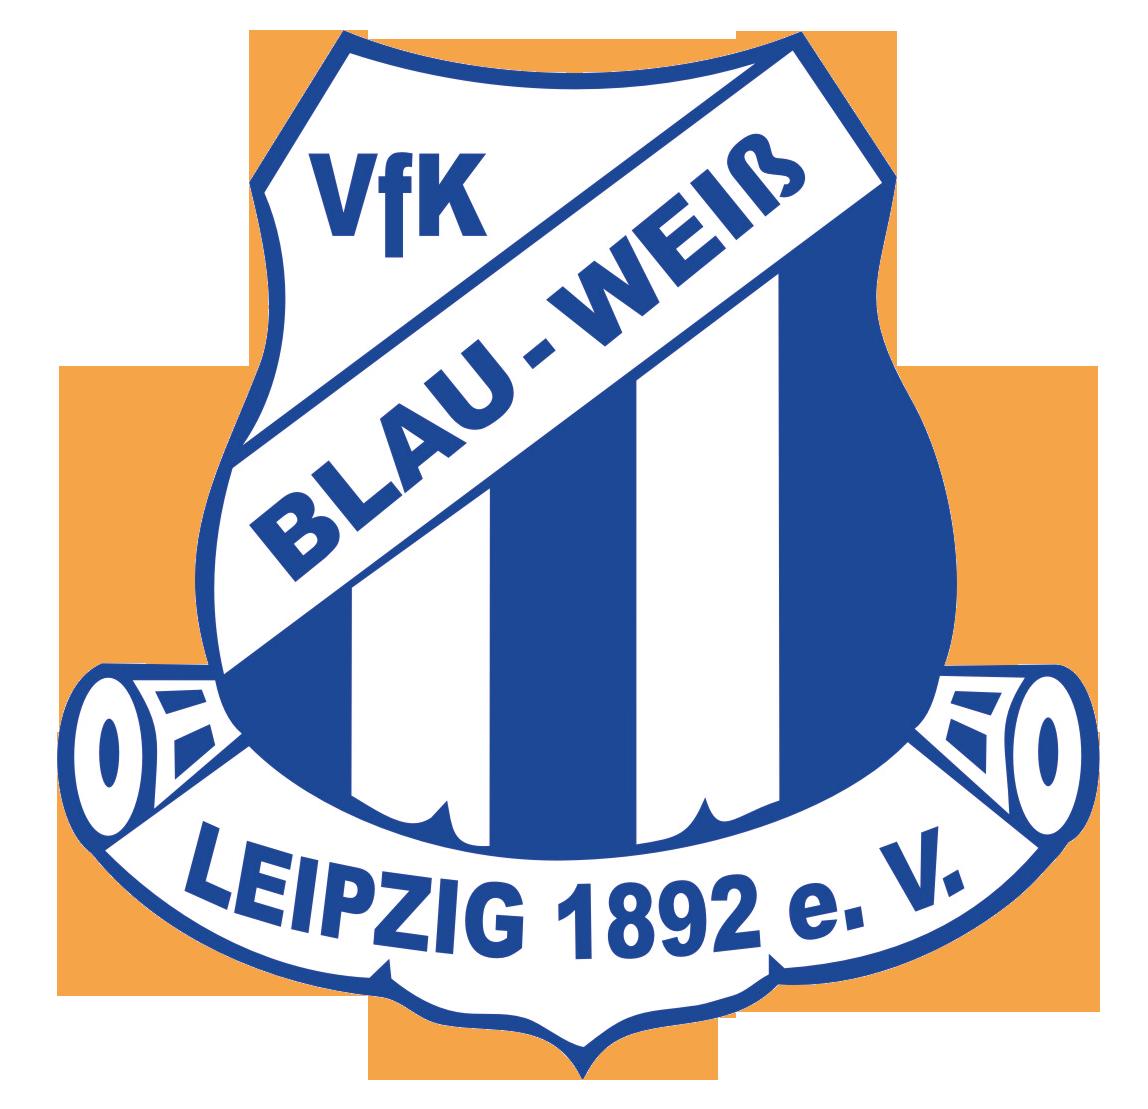 Vfk Blau-Weiß Leipzig